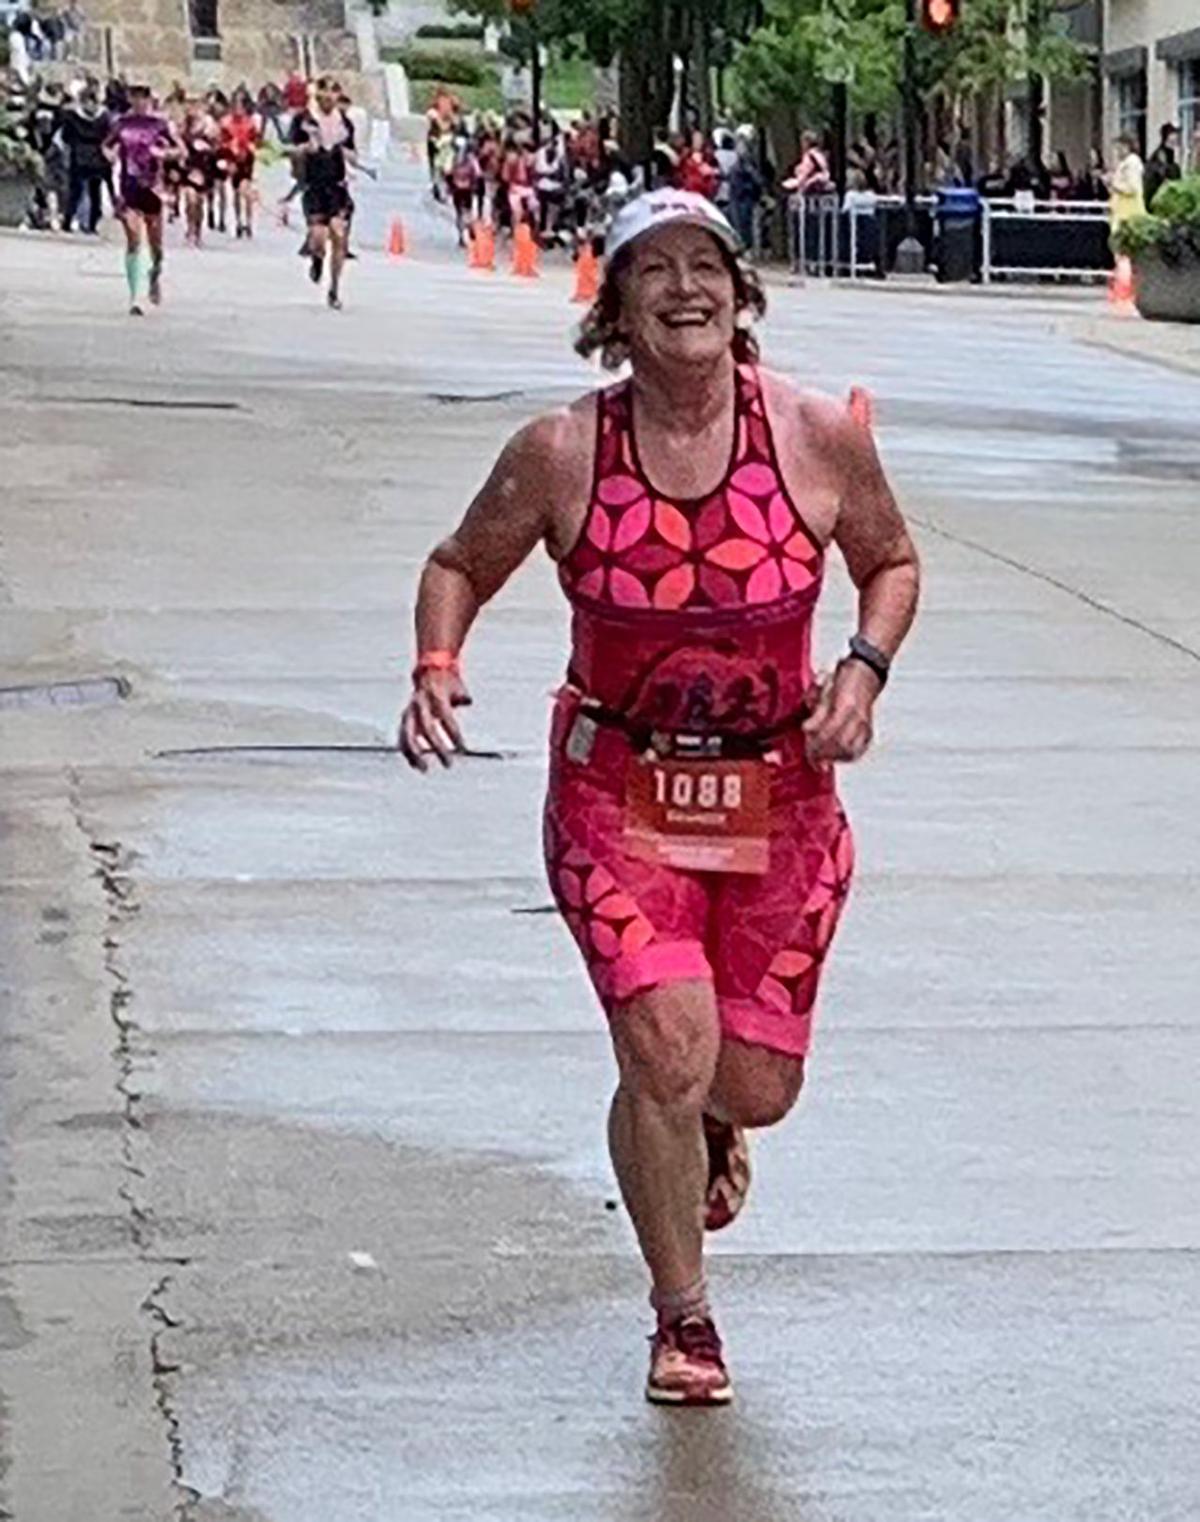 Rhiannon running